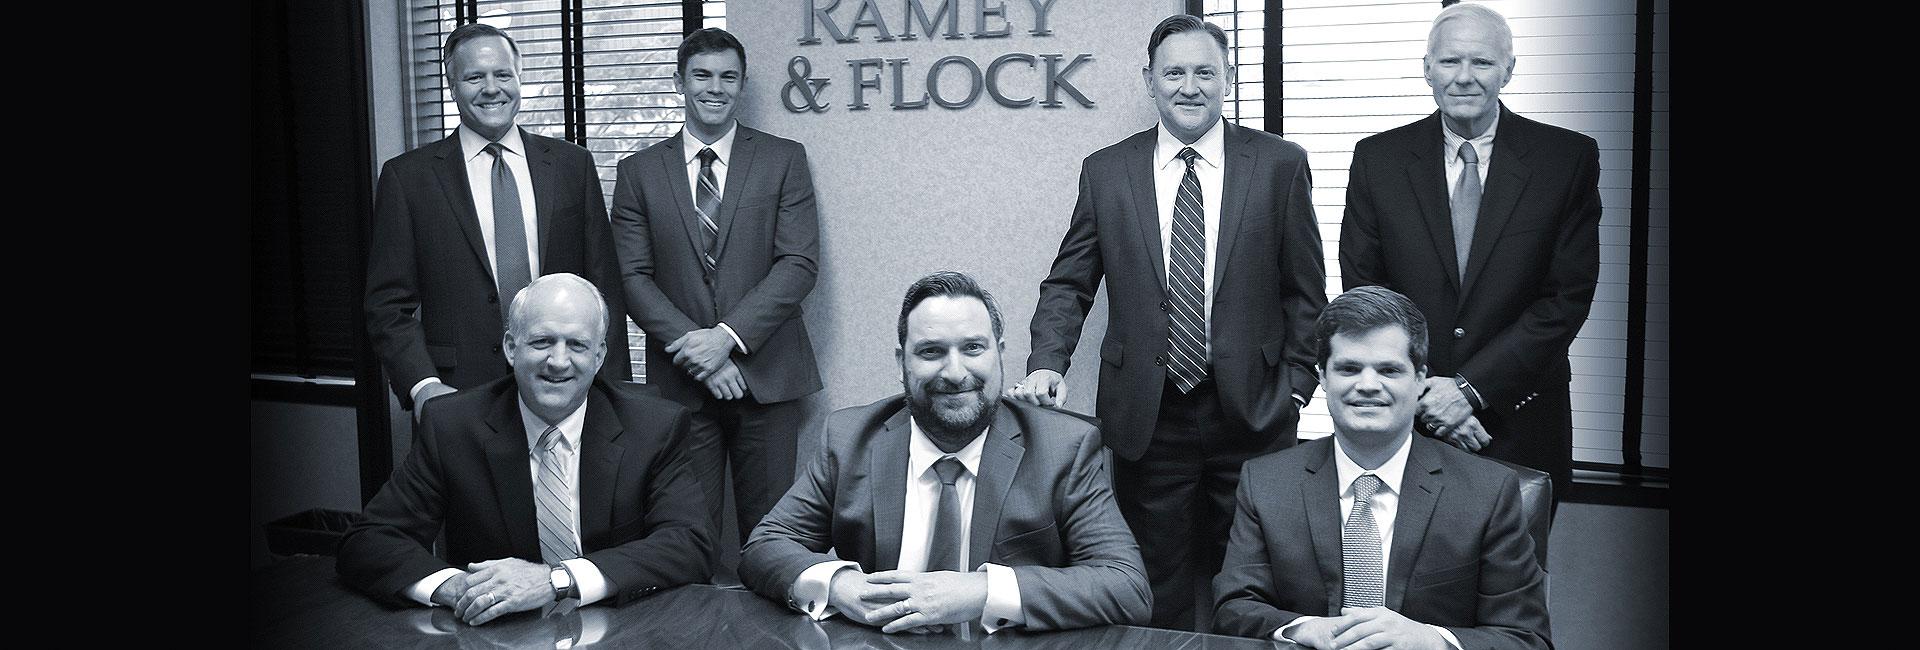 Ramey & Flock Attorney Group